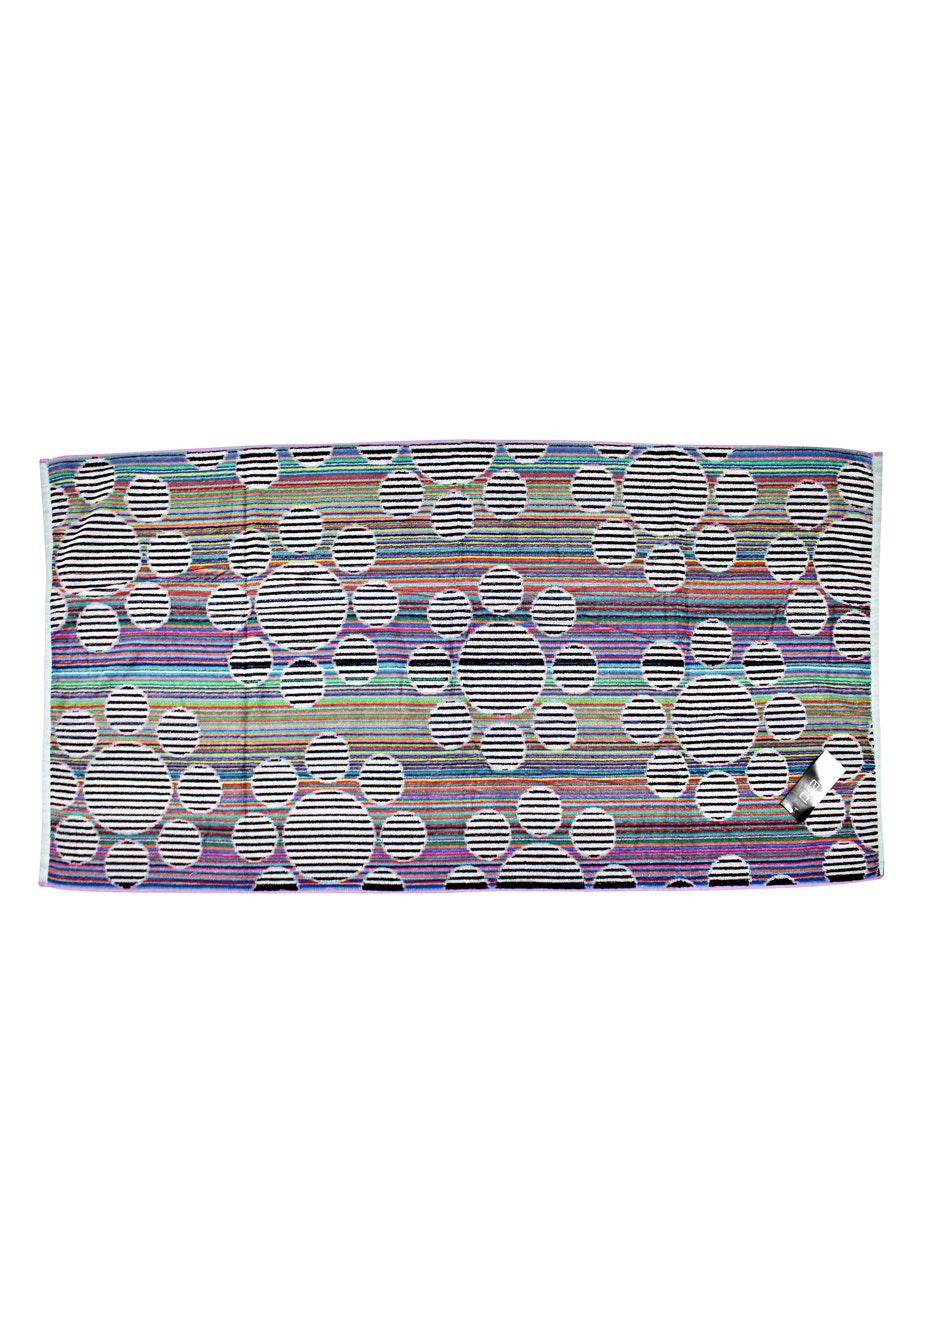 Padma 100% Cotton Velour Jacquard Beach Towel - 75x150cm